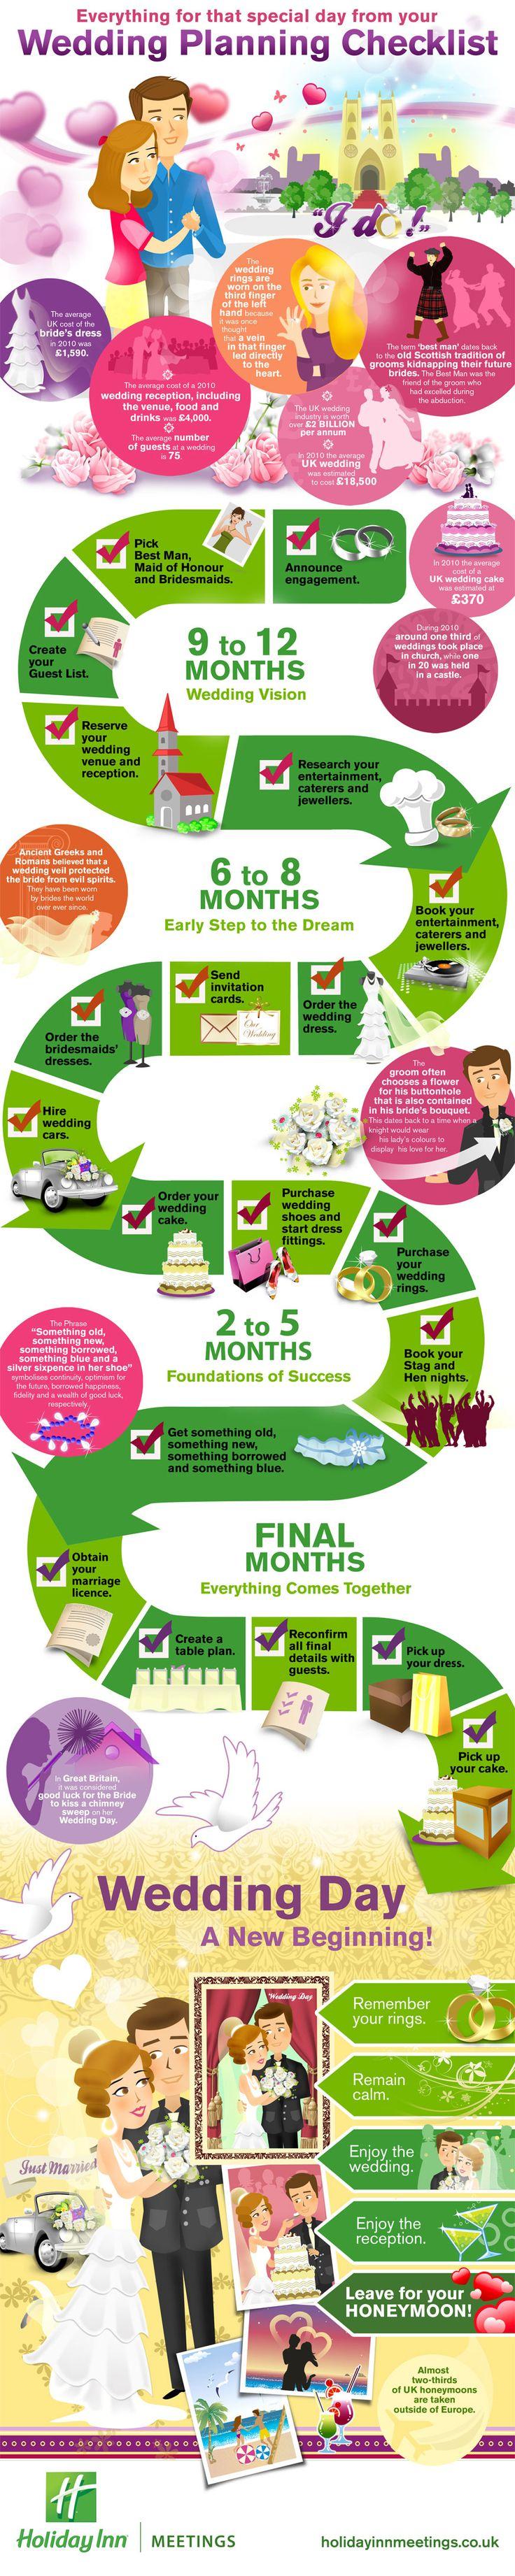 Wedding Planning Check List. #WeddingPlanning